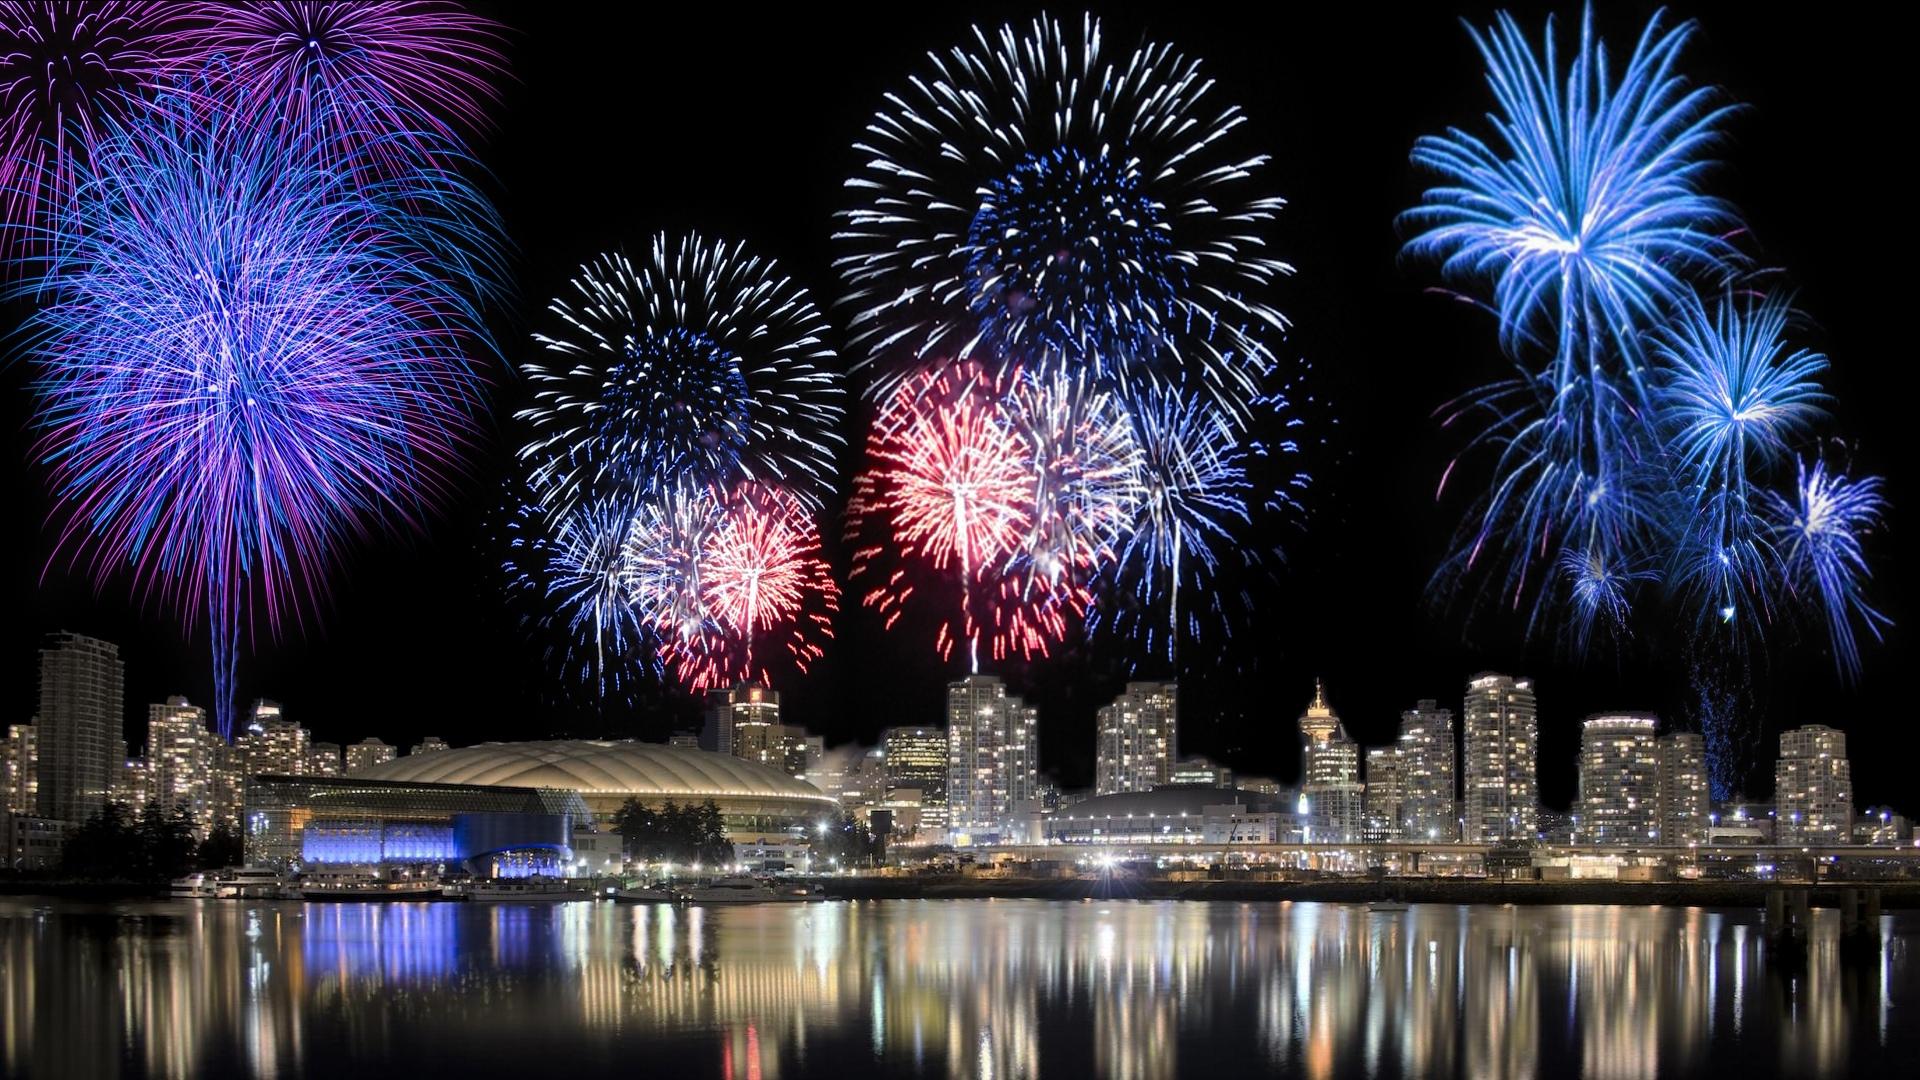 ... Fireworks Wallpaper · Fireworks Wallpaper